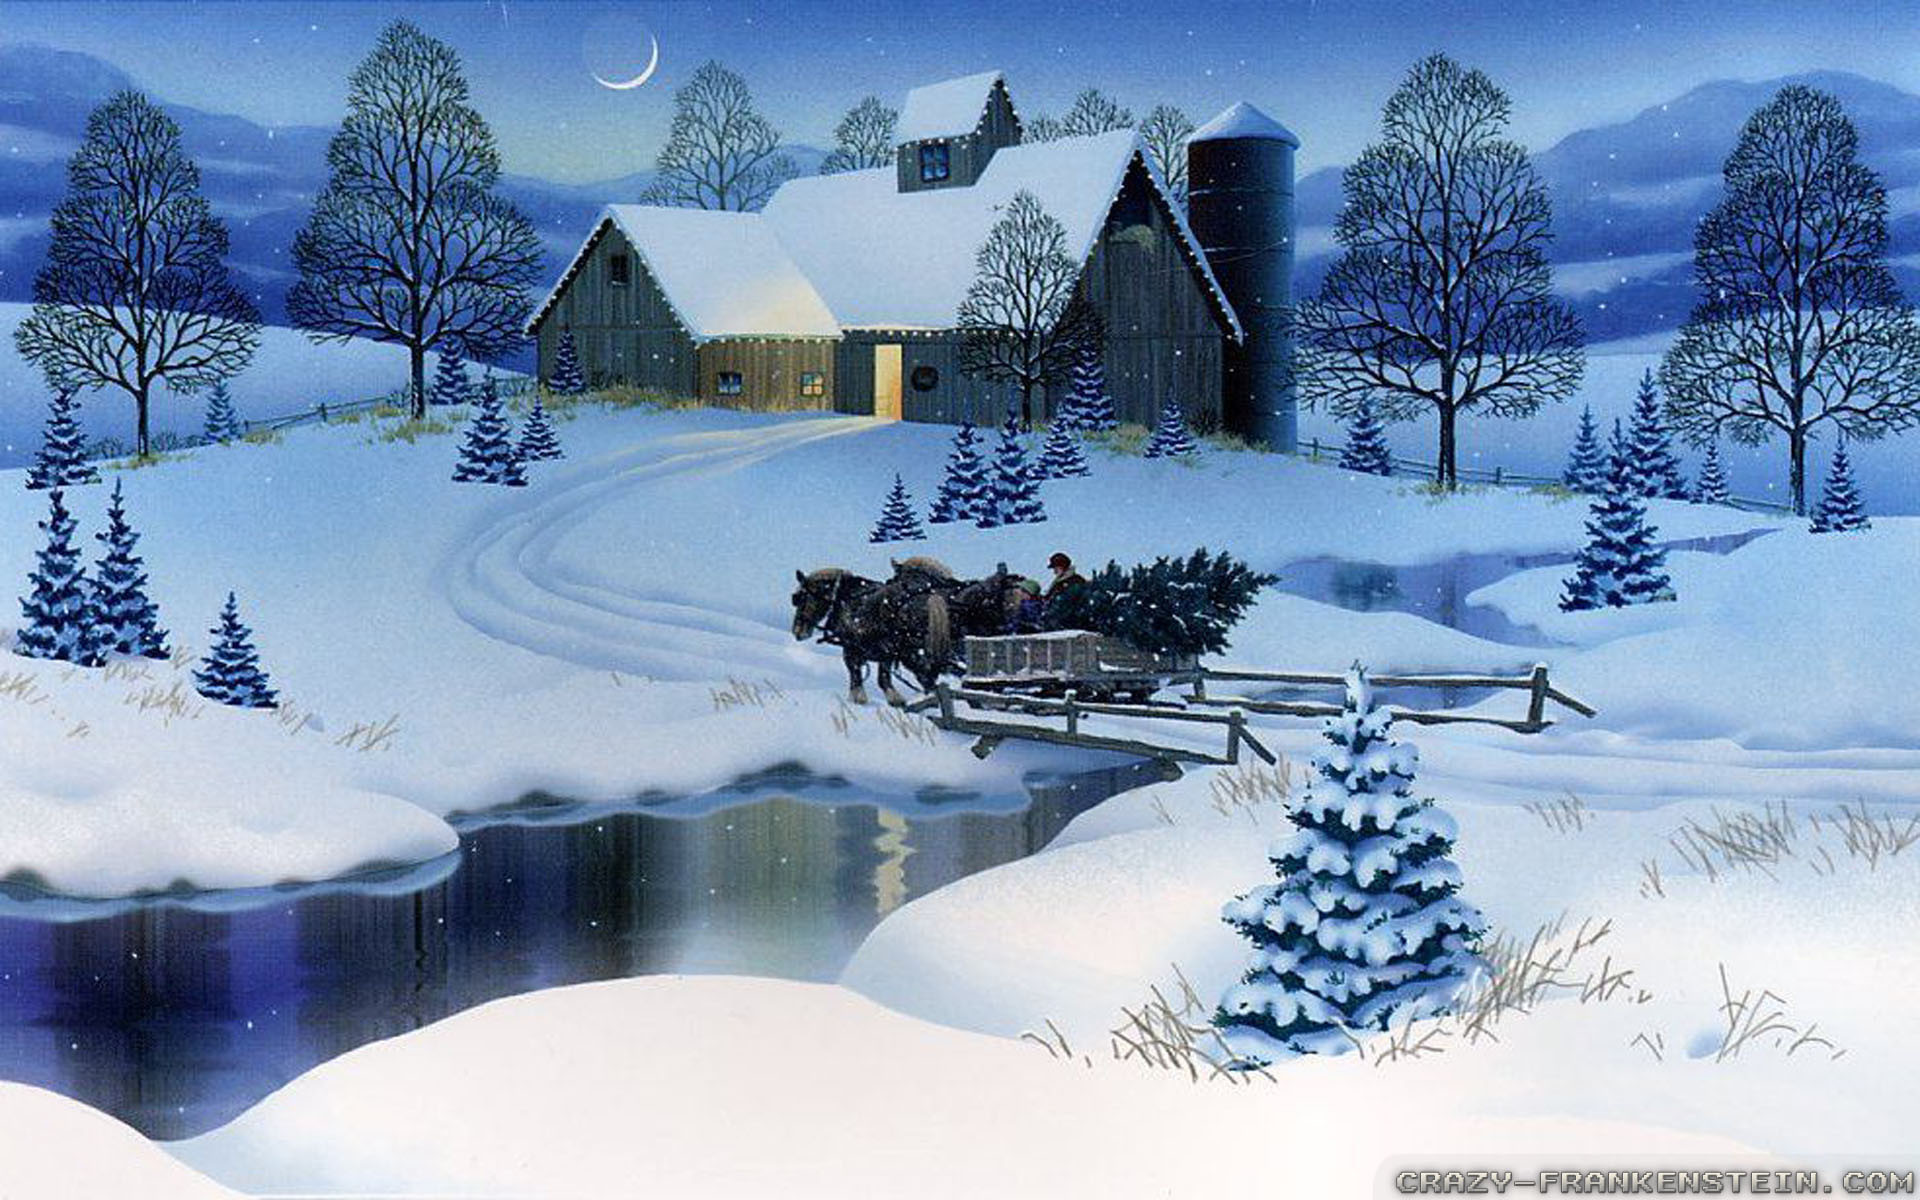 Wallpaper: Village scene winter Christmas wallpapers. Resolution: 1024×768  | 1280×1024 | 1600×1200. Widescreen Res: 1440×900 | 1680×1050 | 1920×1200